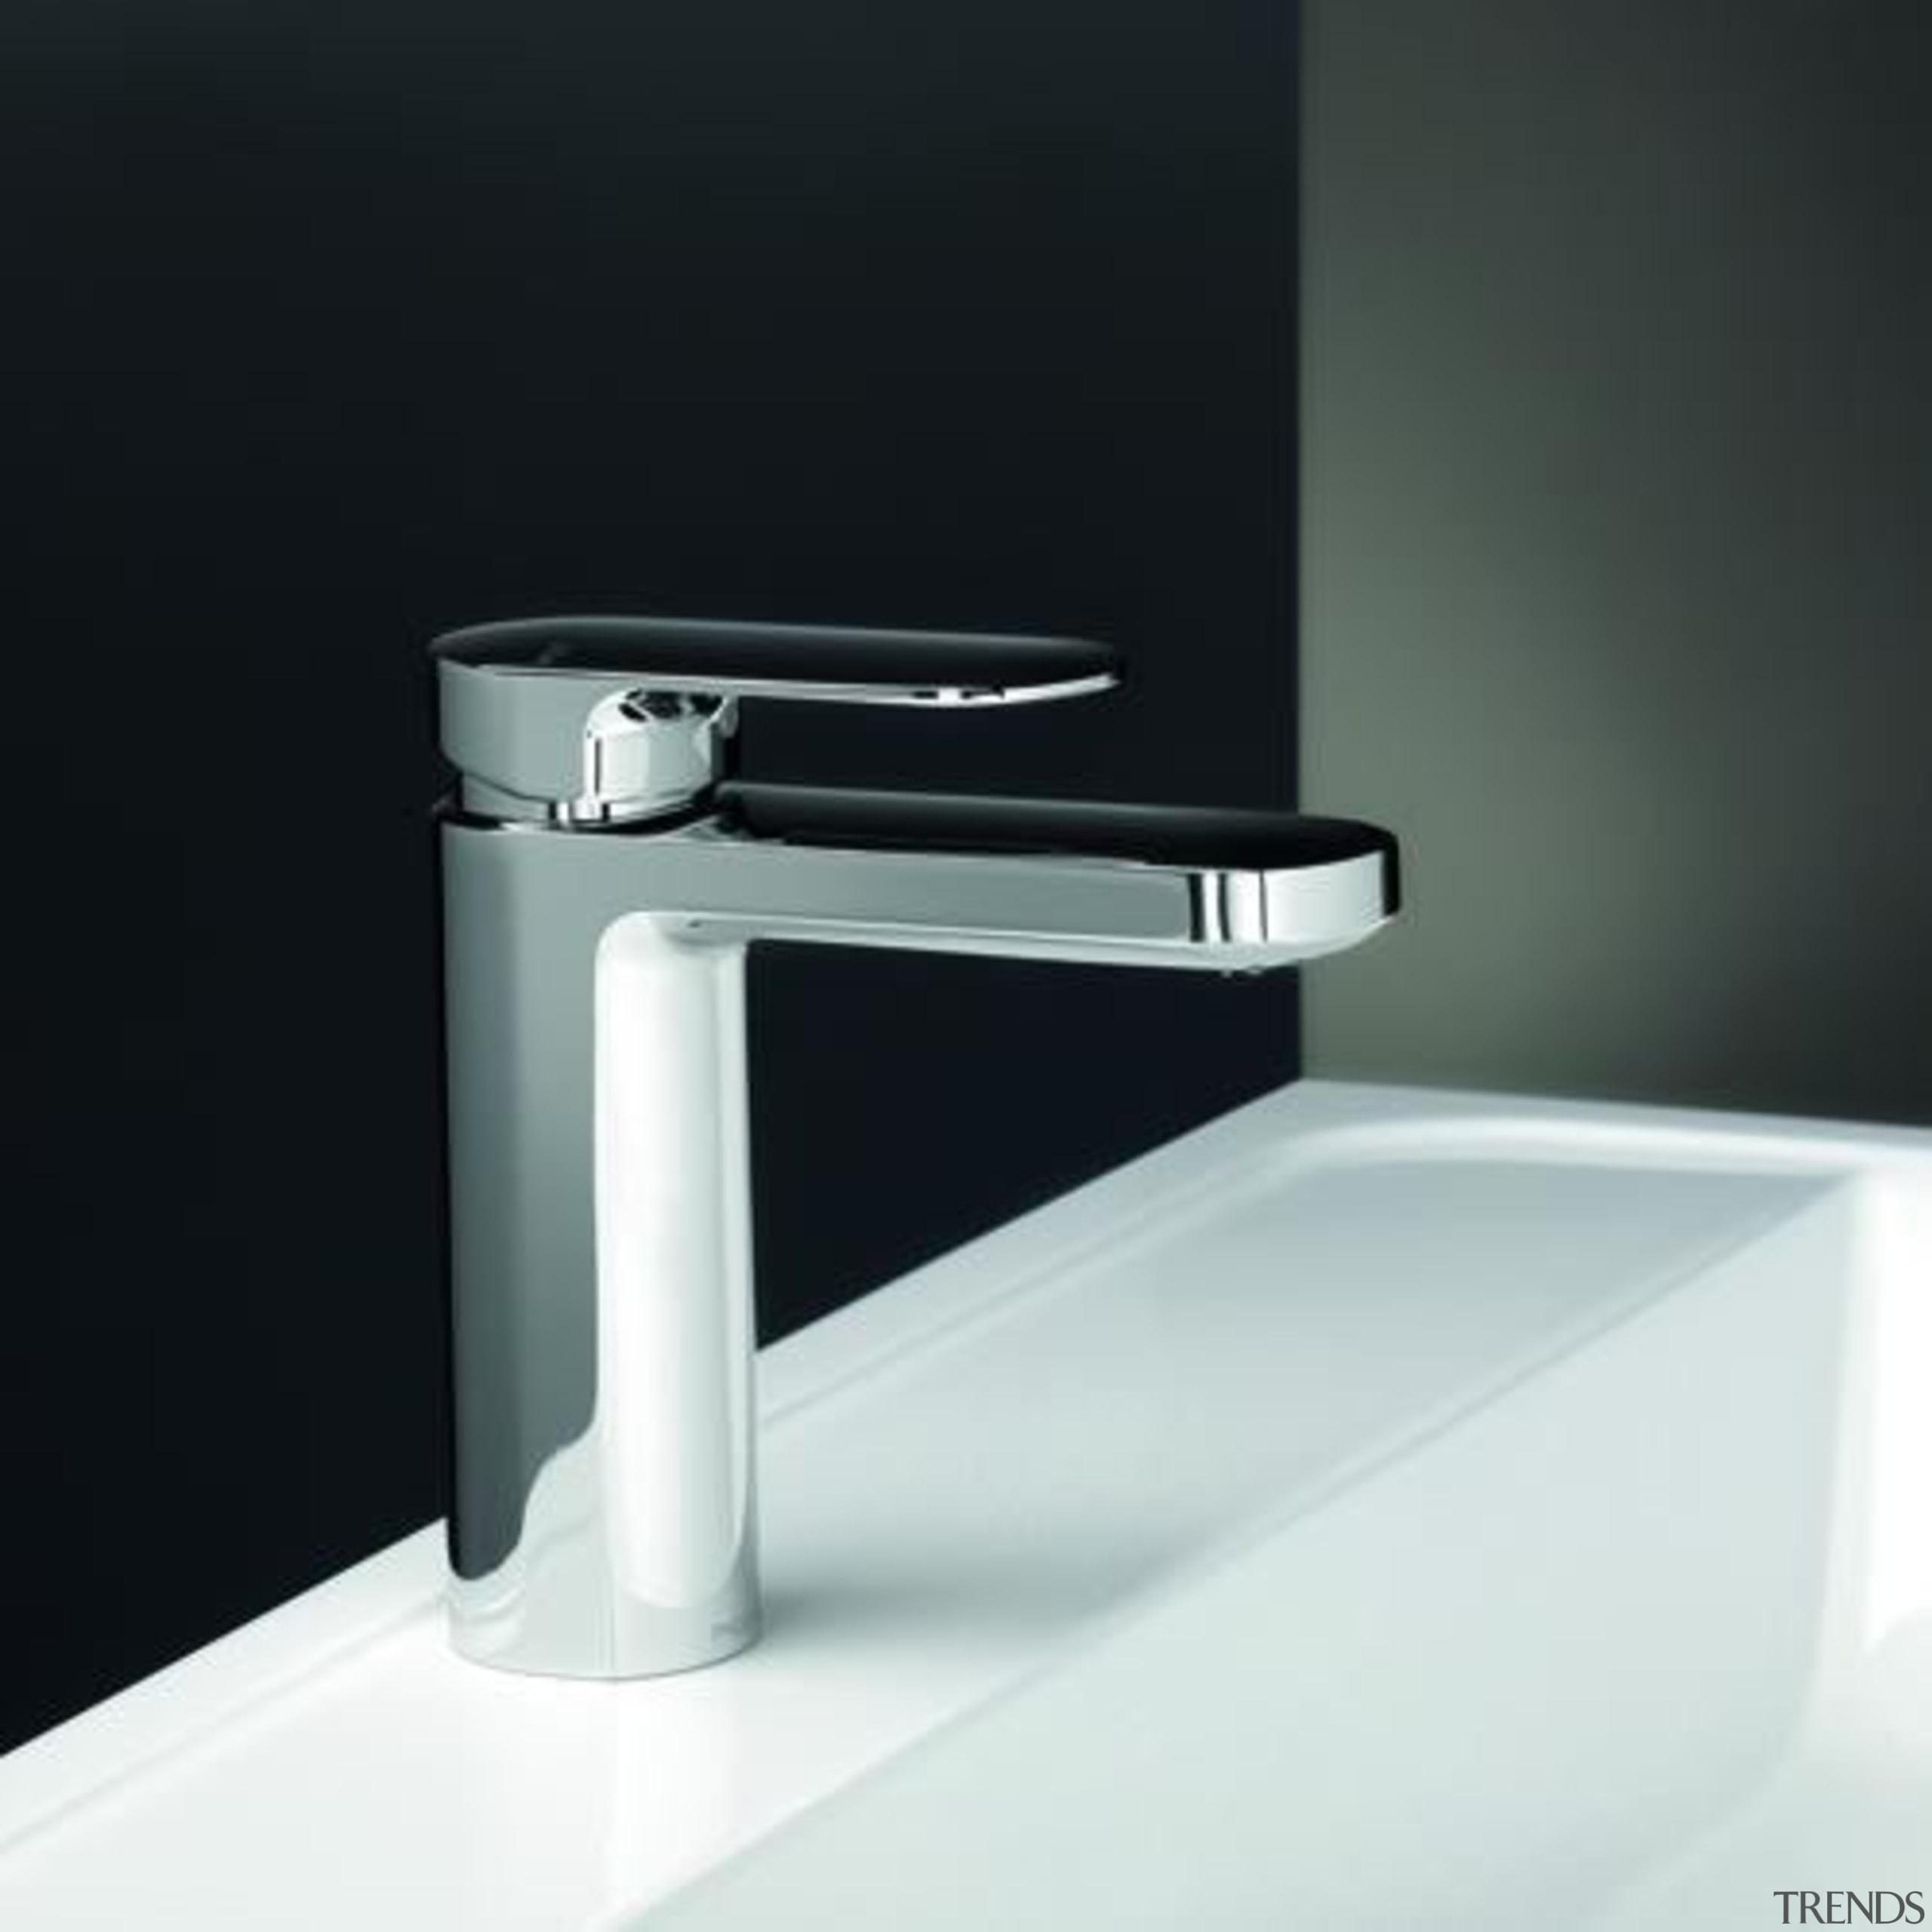 Cerchio Basin Mixer - Cerchio Basin Mixer - angle, bathroom sink, hardware, plumbing fixture, product, product design, tap, black, white